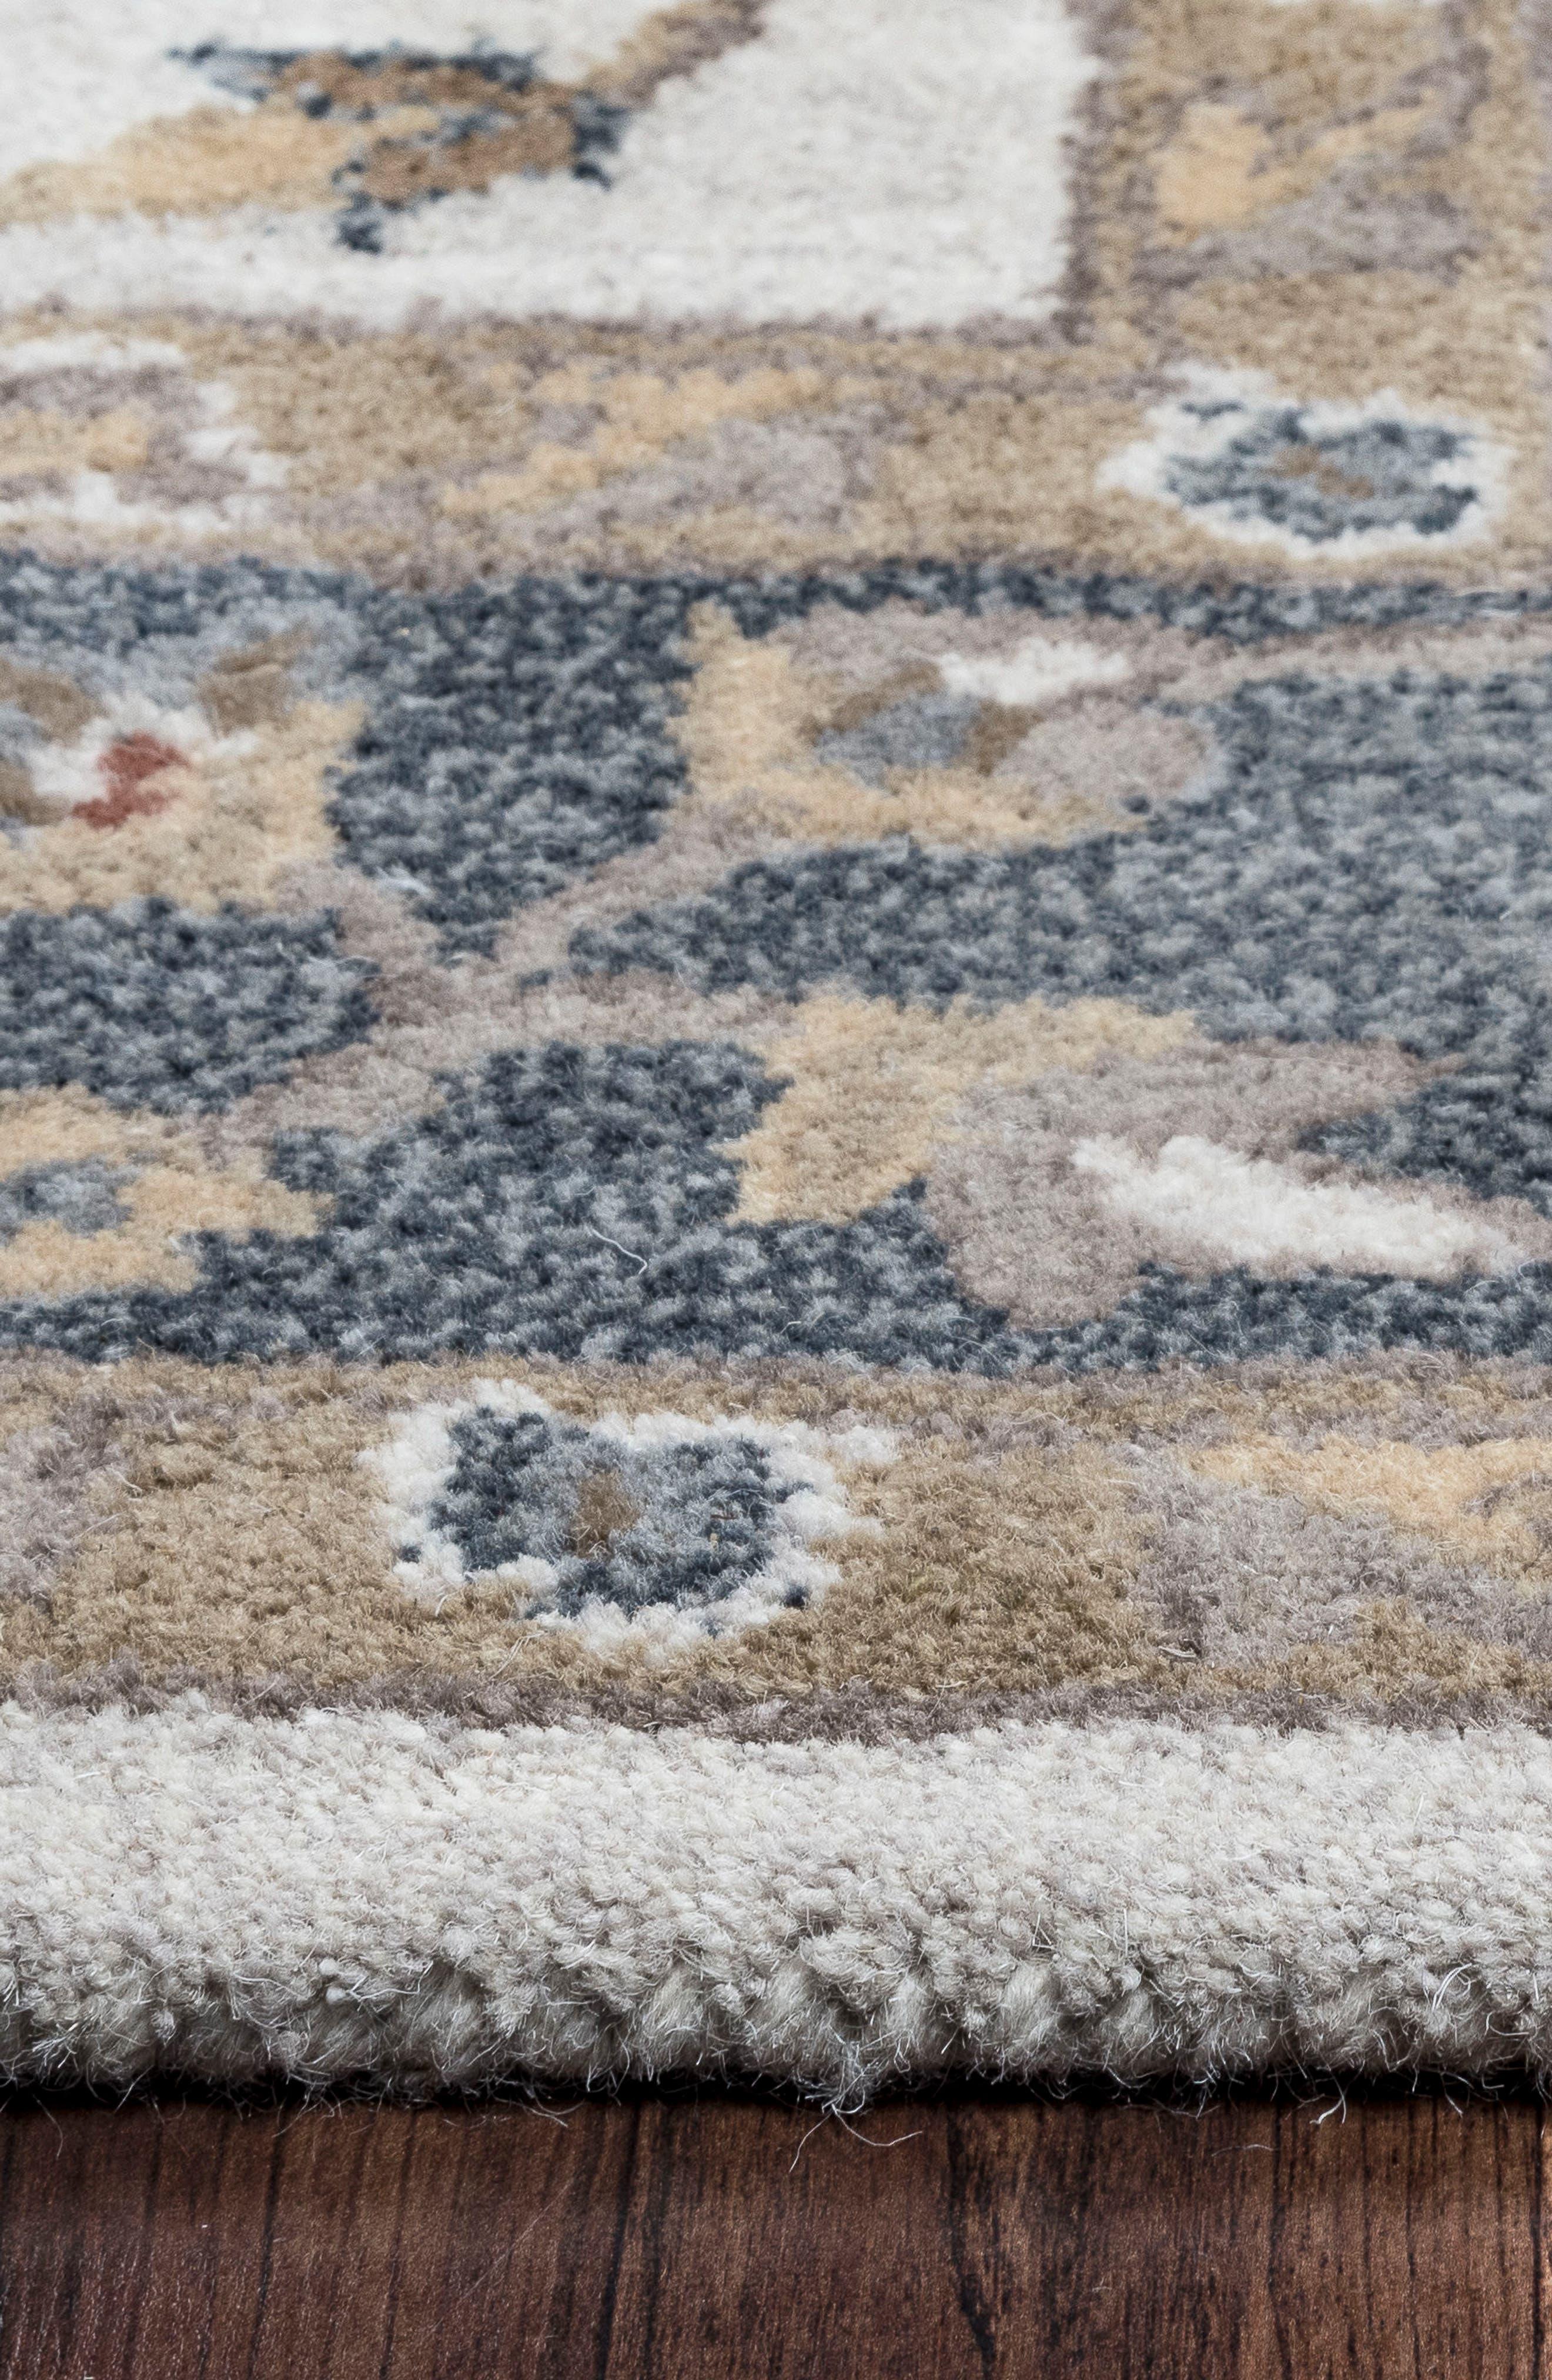 'Valintino Border' Hand Tufted Wool Area Rug,                             Alternate thumbnail 3, color,                             250